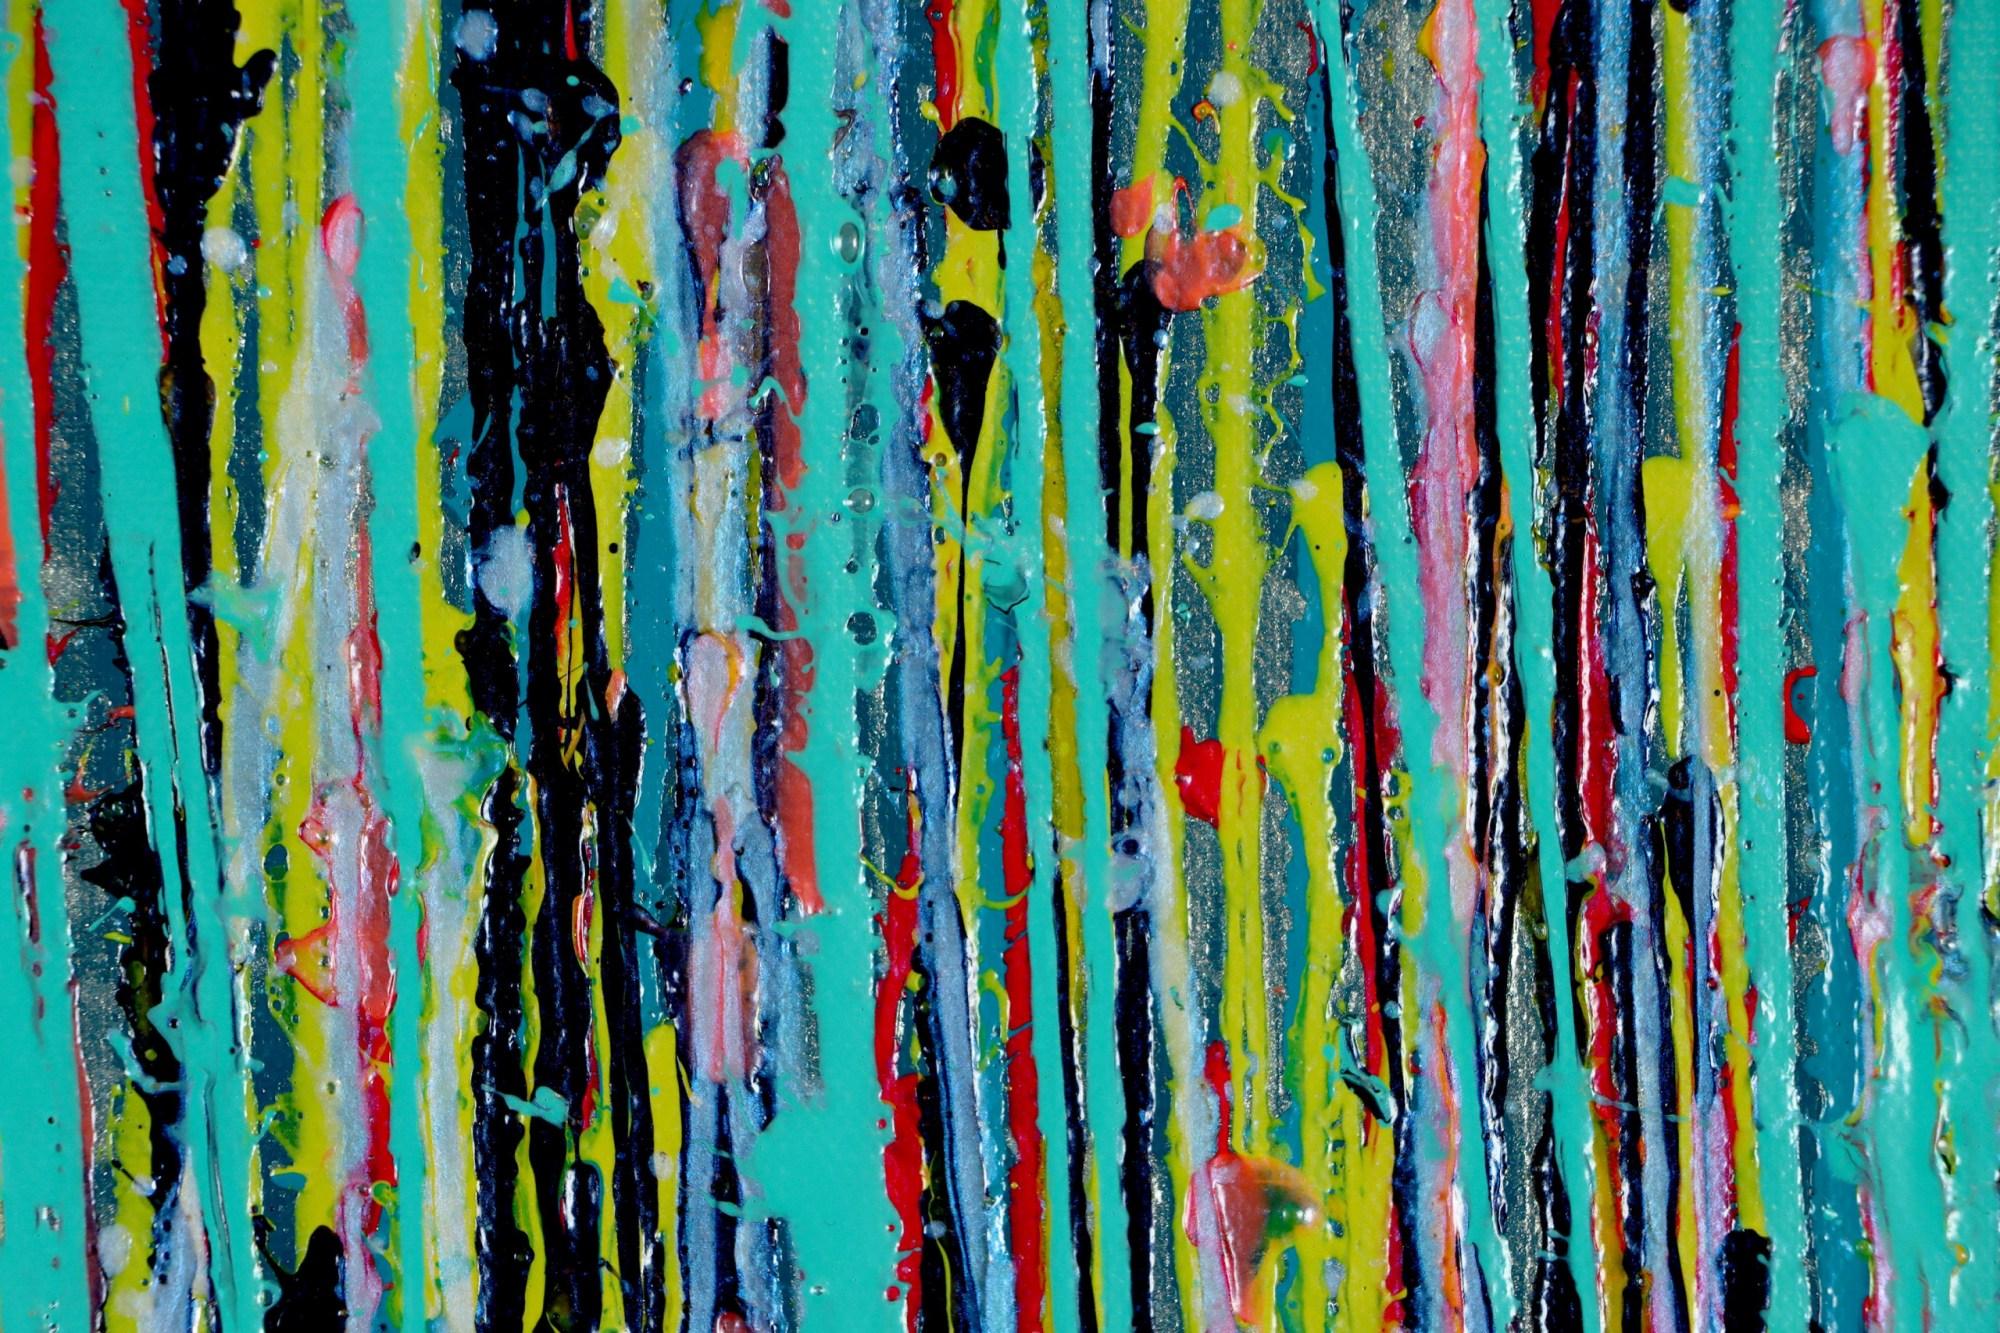 DETAIL / Blue Symphony (Natures Dance) 2 (2021) - 24x36 in / Artist: Nestor Toro